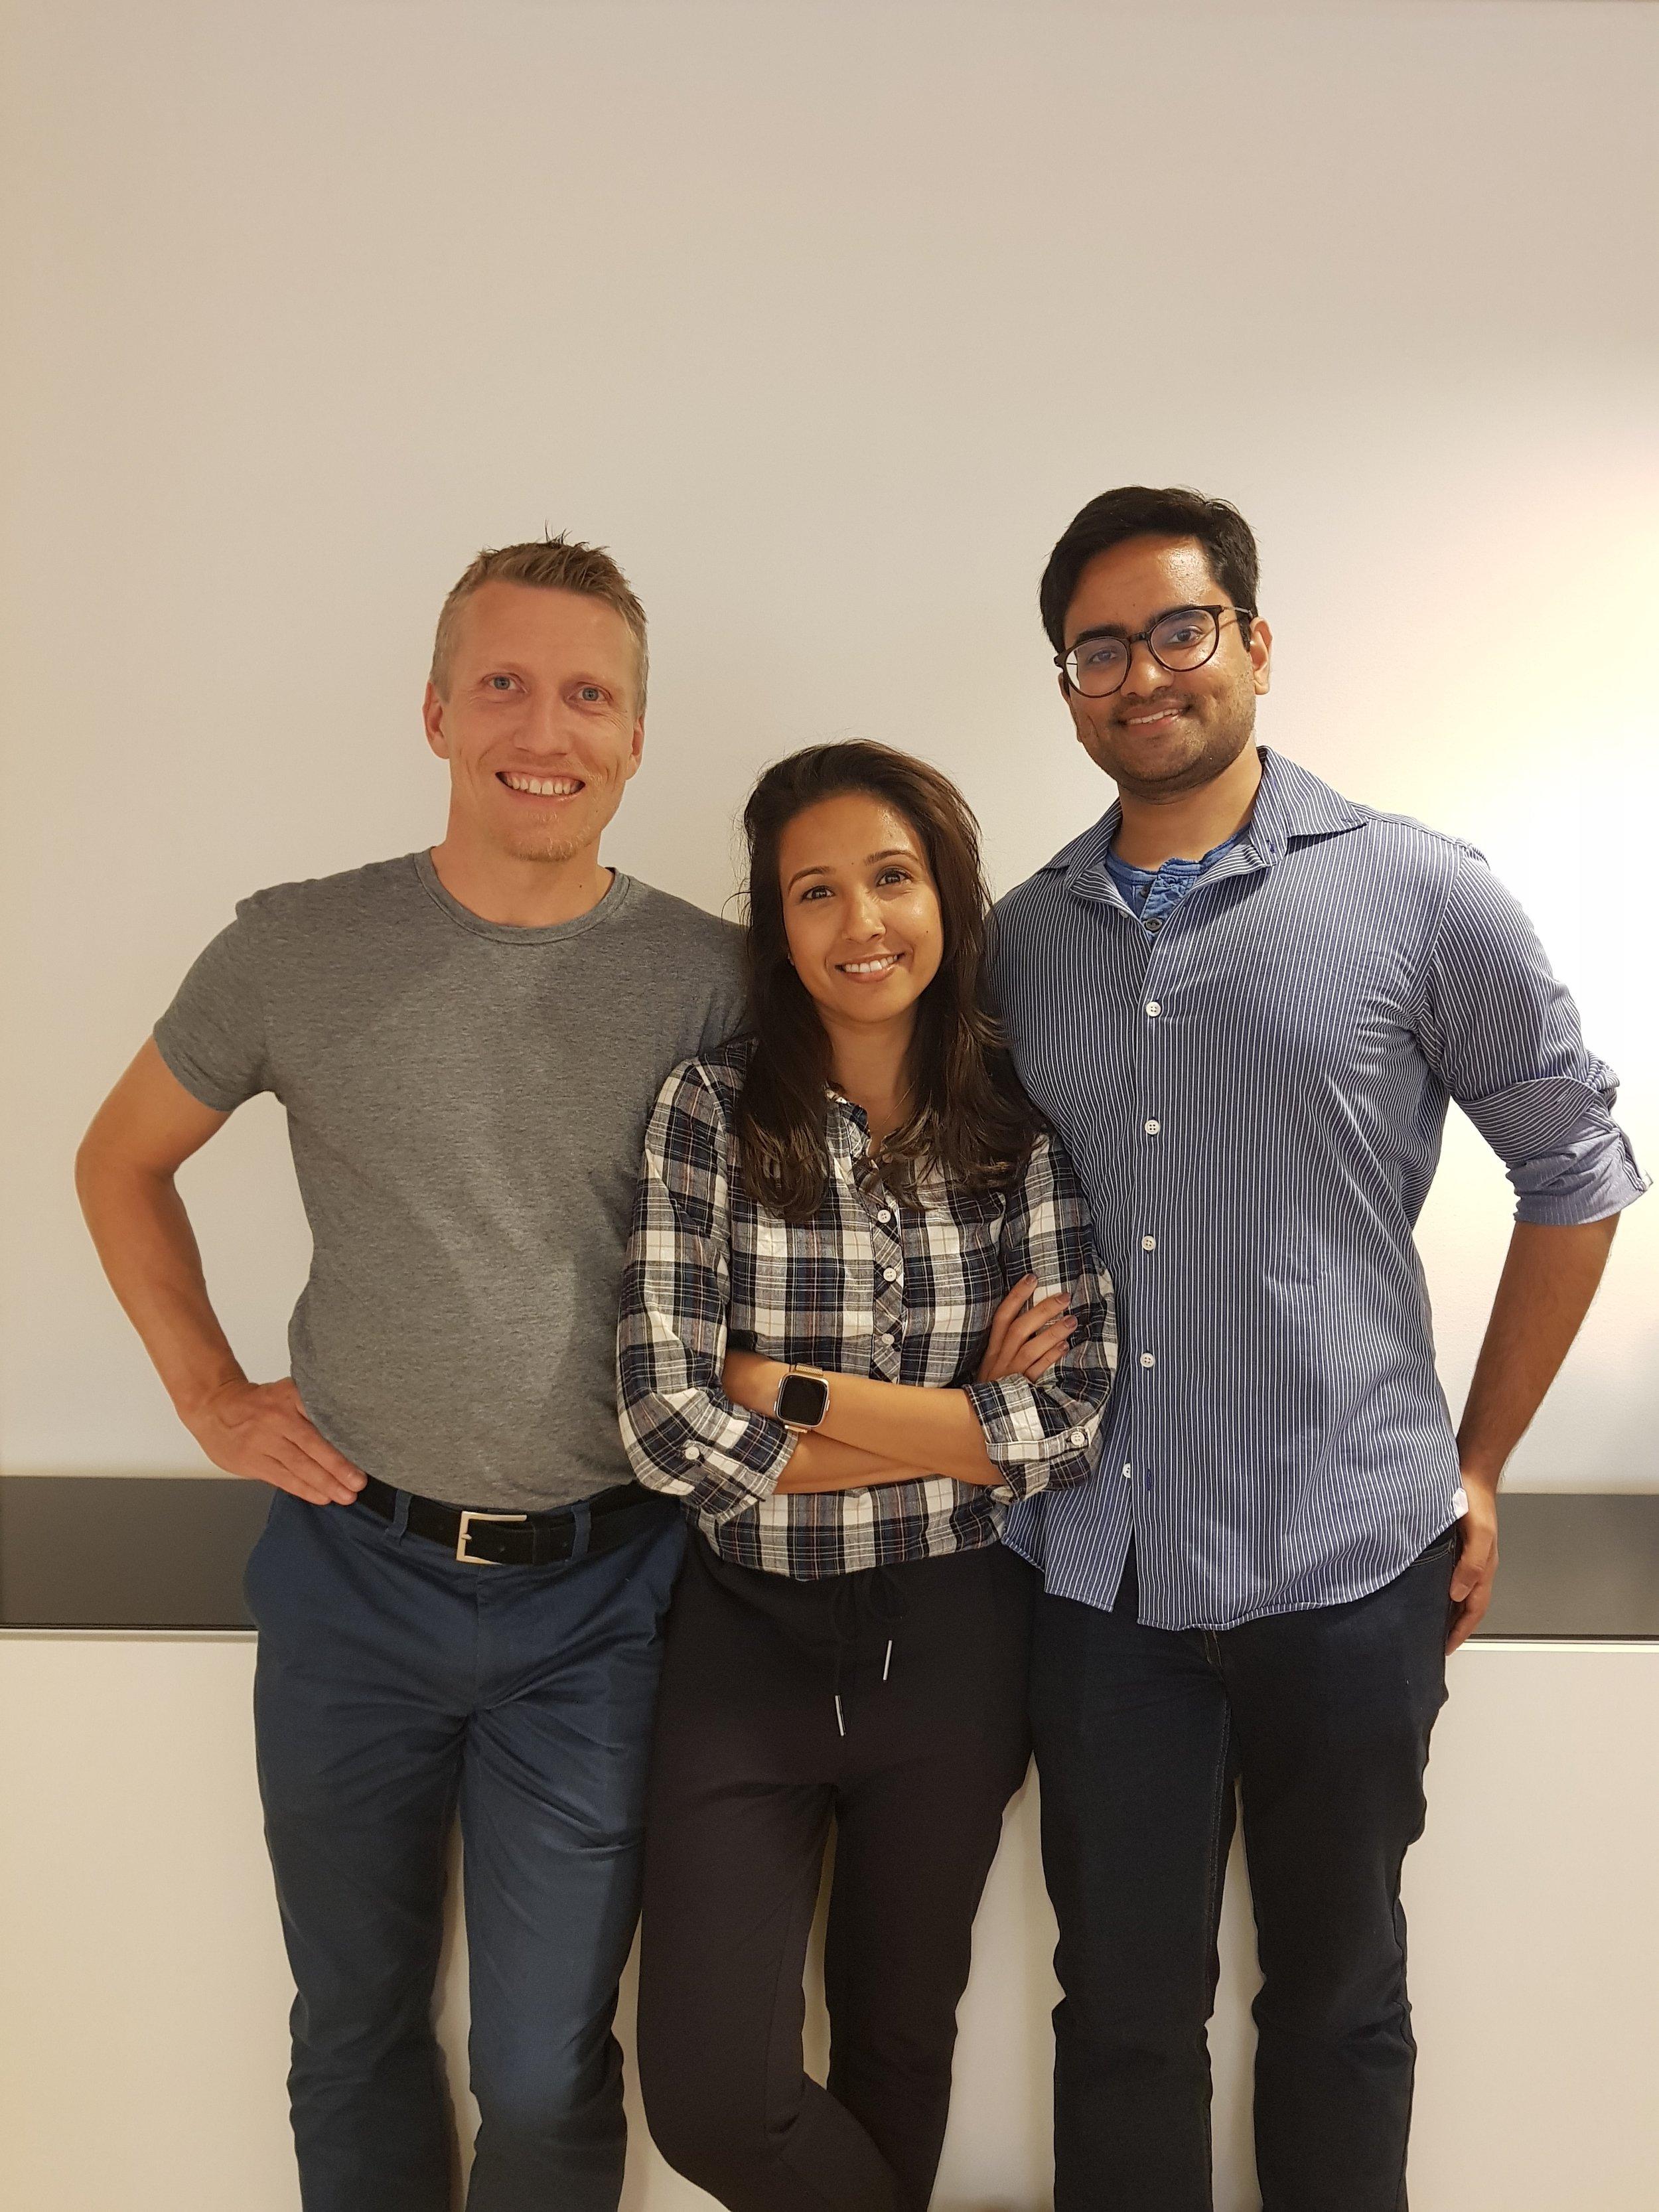 - The Skyqraft Team; David Almroth, Sakina Turab Ali & Umar Chughtai